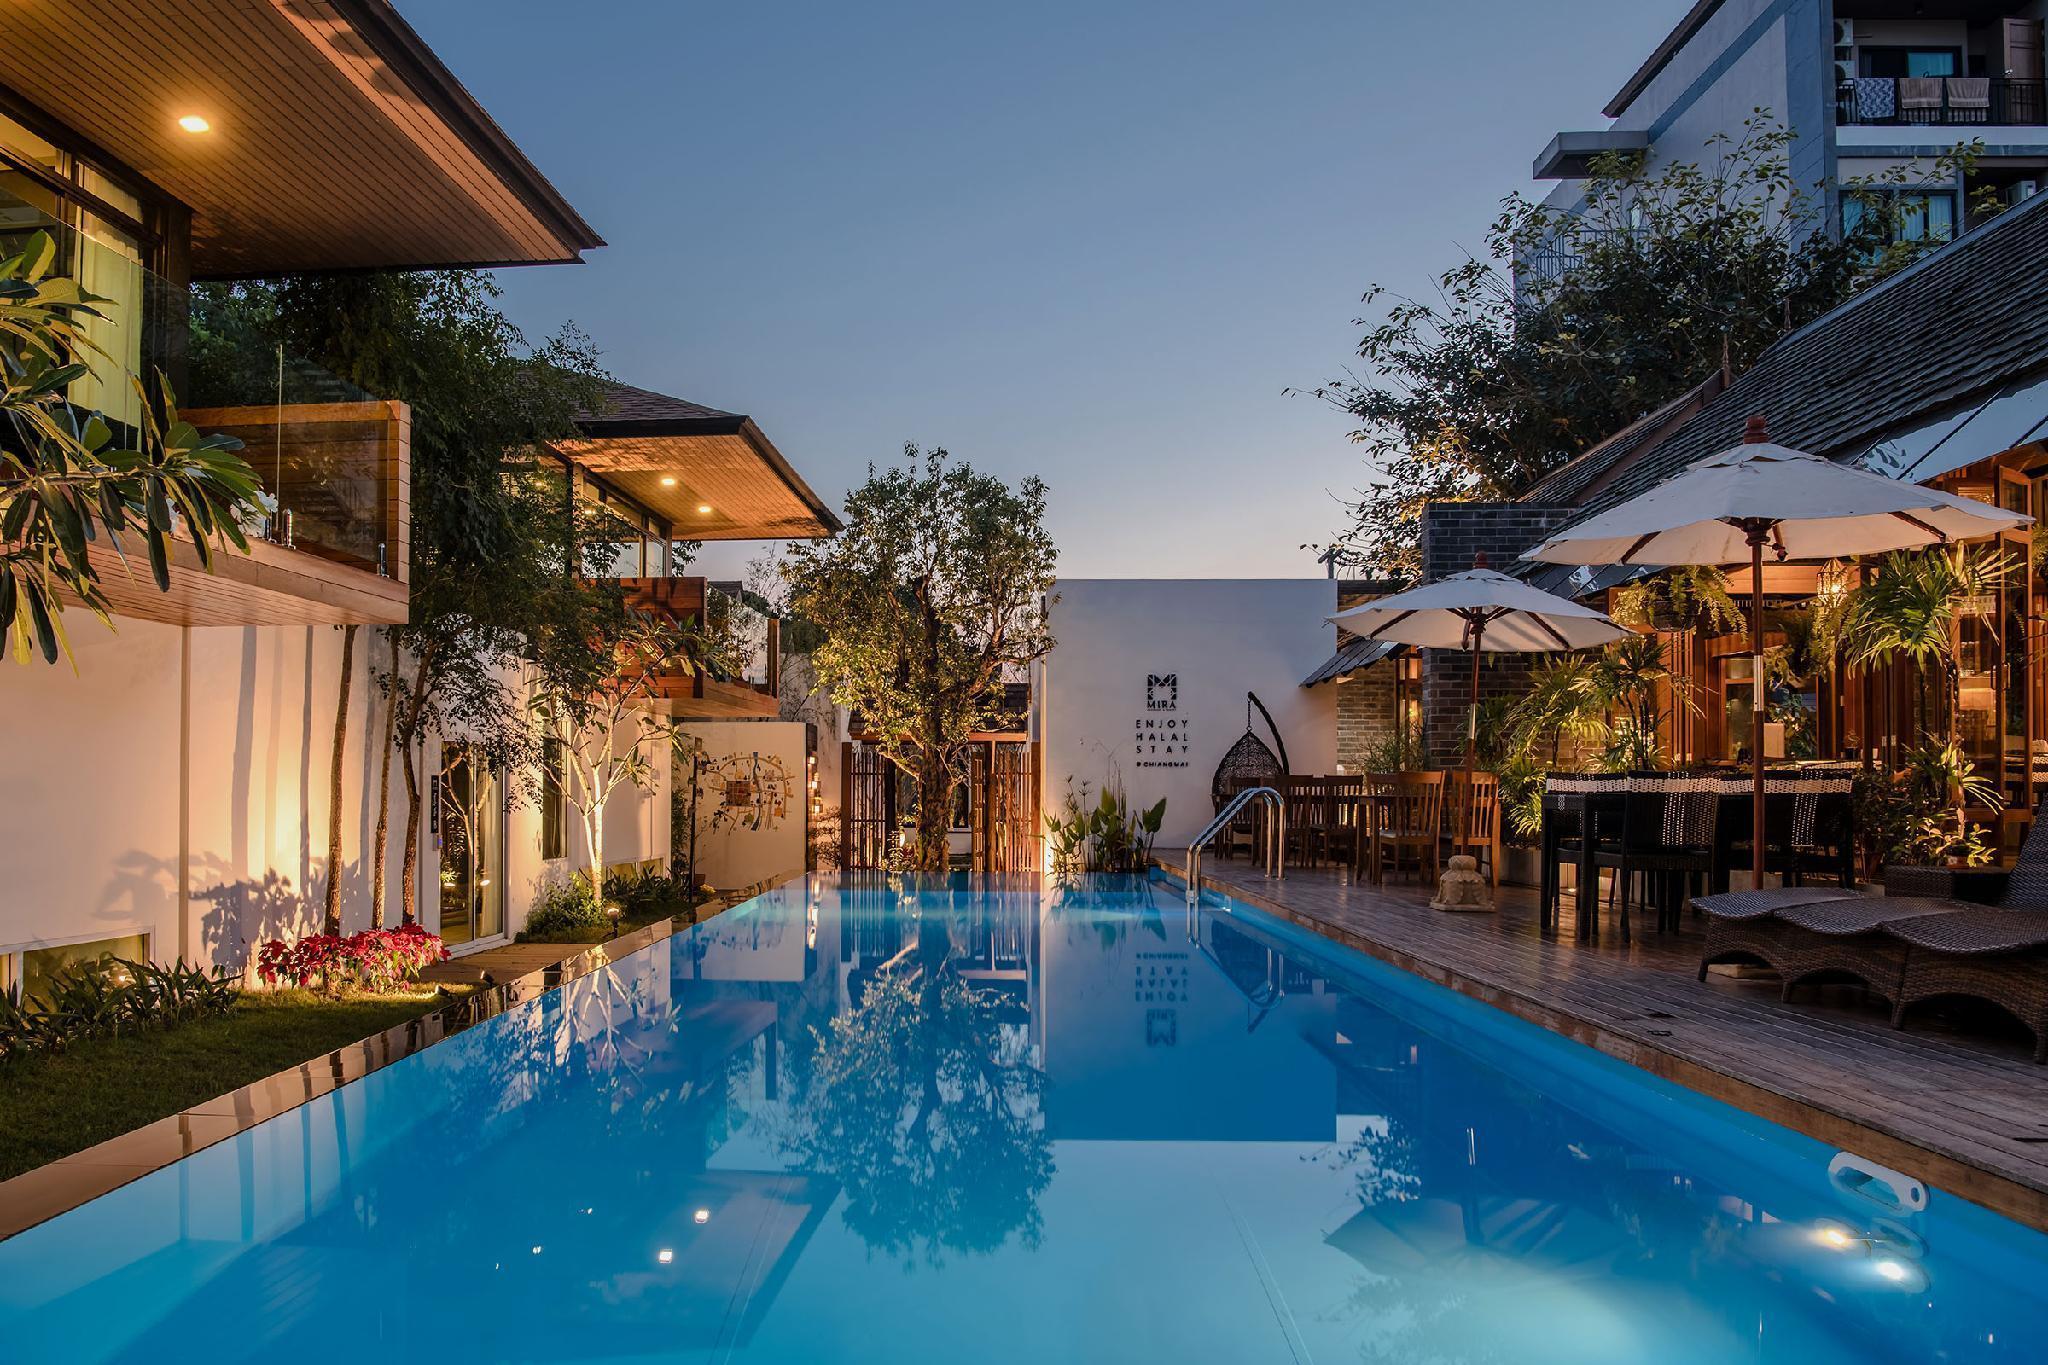 Mira Residence & Resort (halal) มิรา เรสซิเดนซ์ แอนด์ รีสอร์ต (ฮาลาล)